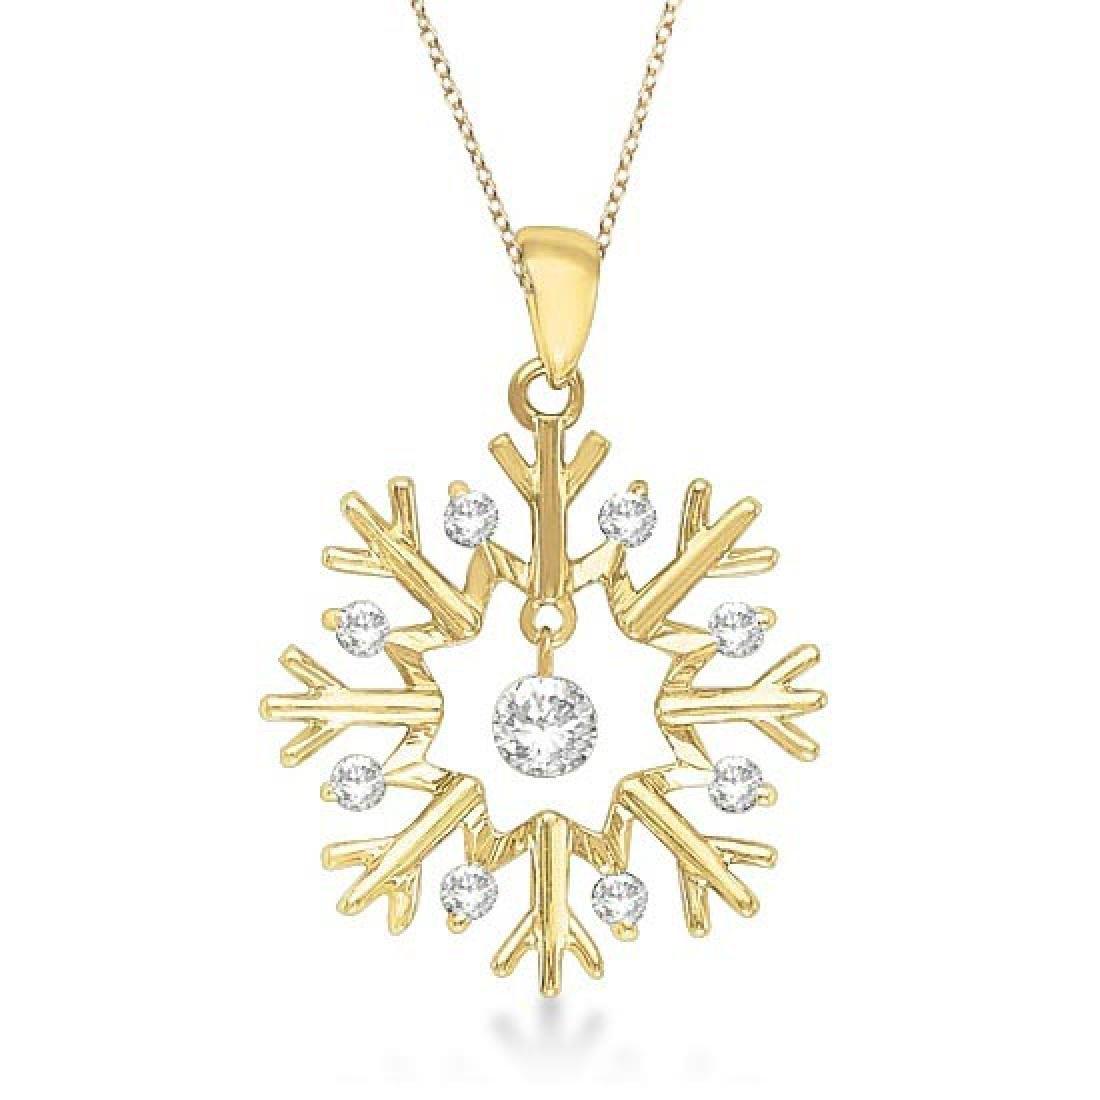 Snowflake Shaped Diamond Pendant Necklace 14k Yellow Go